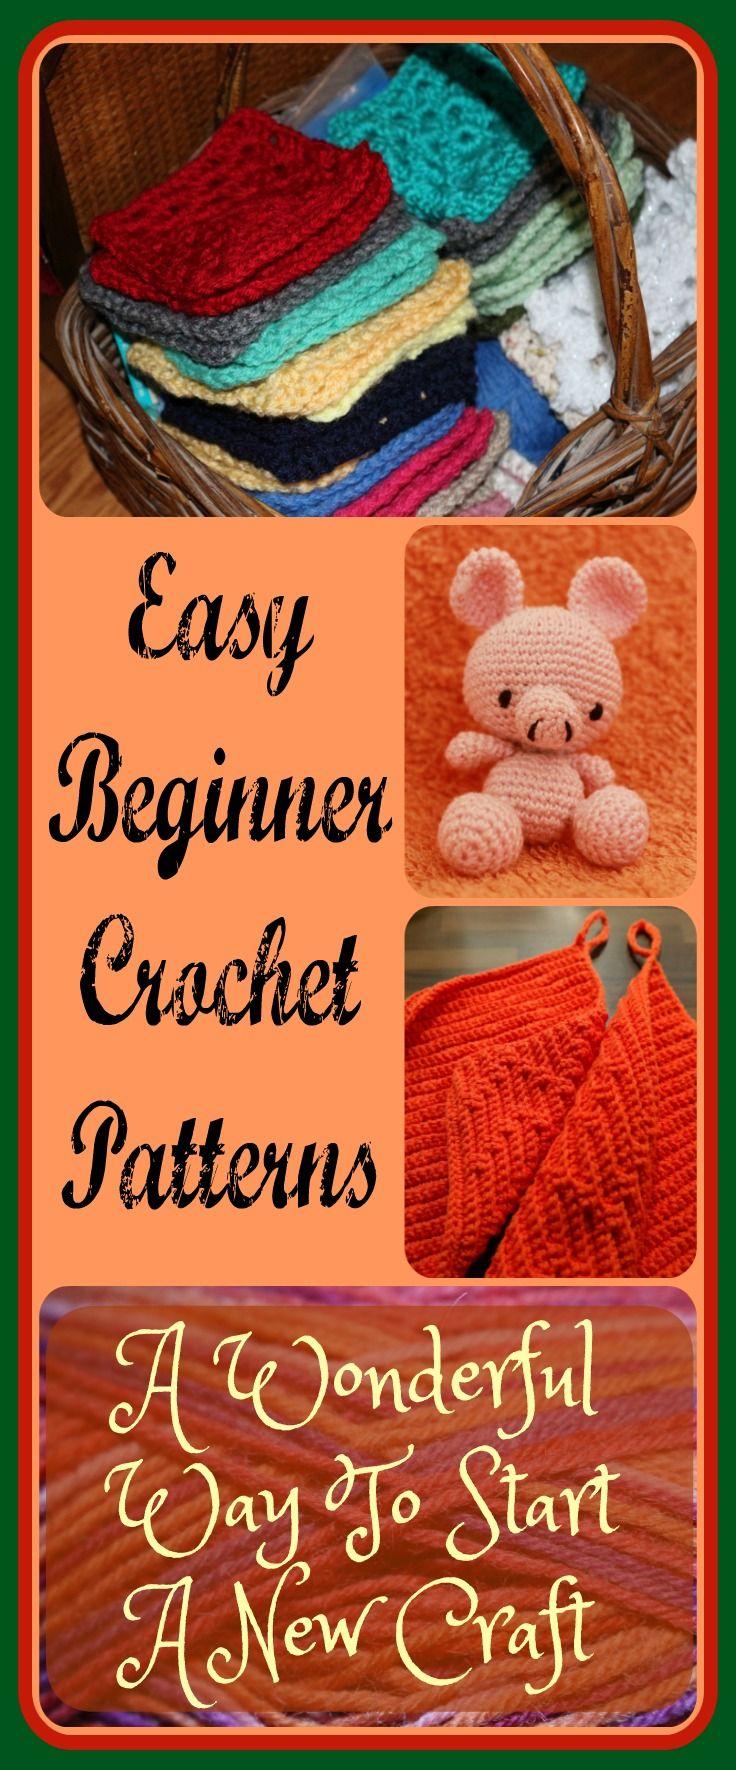 Easy beginner crochet patterns a wonderful way to start a new easy beginner crochet patterns a wonderful way to start a new craft bankloansurffo Gallery